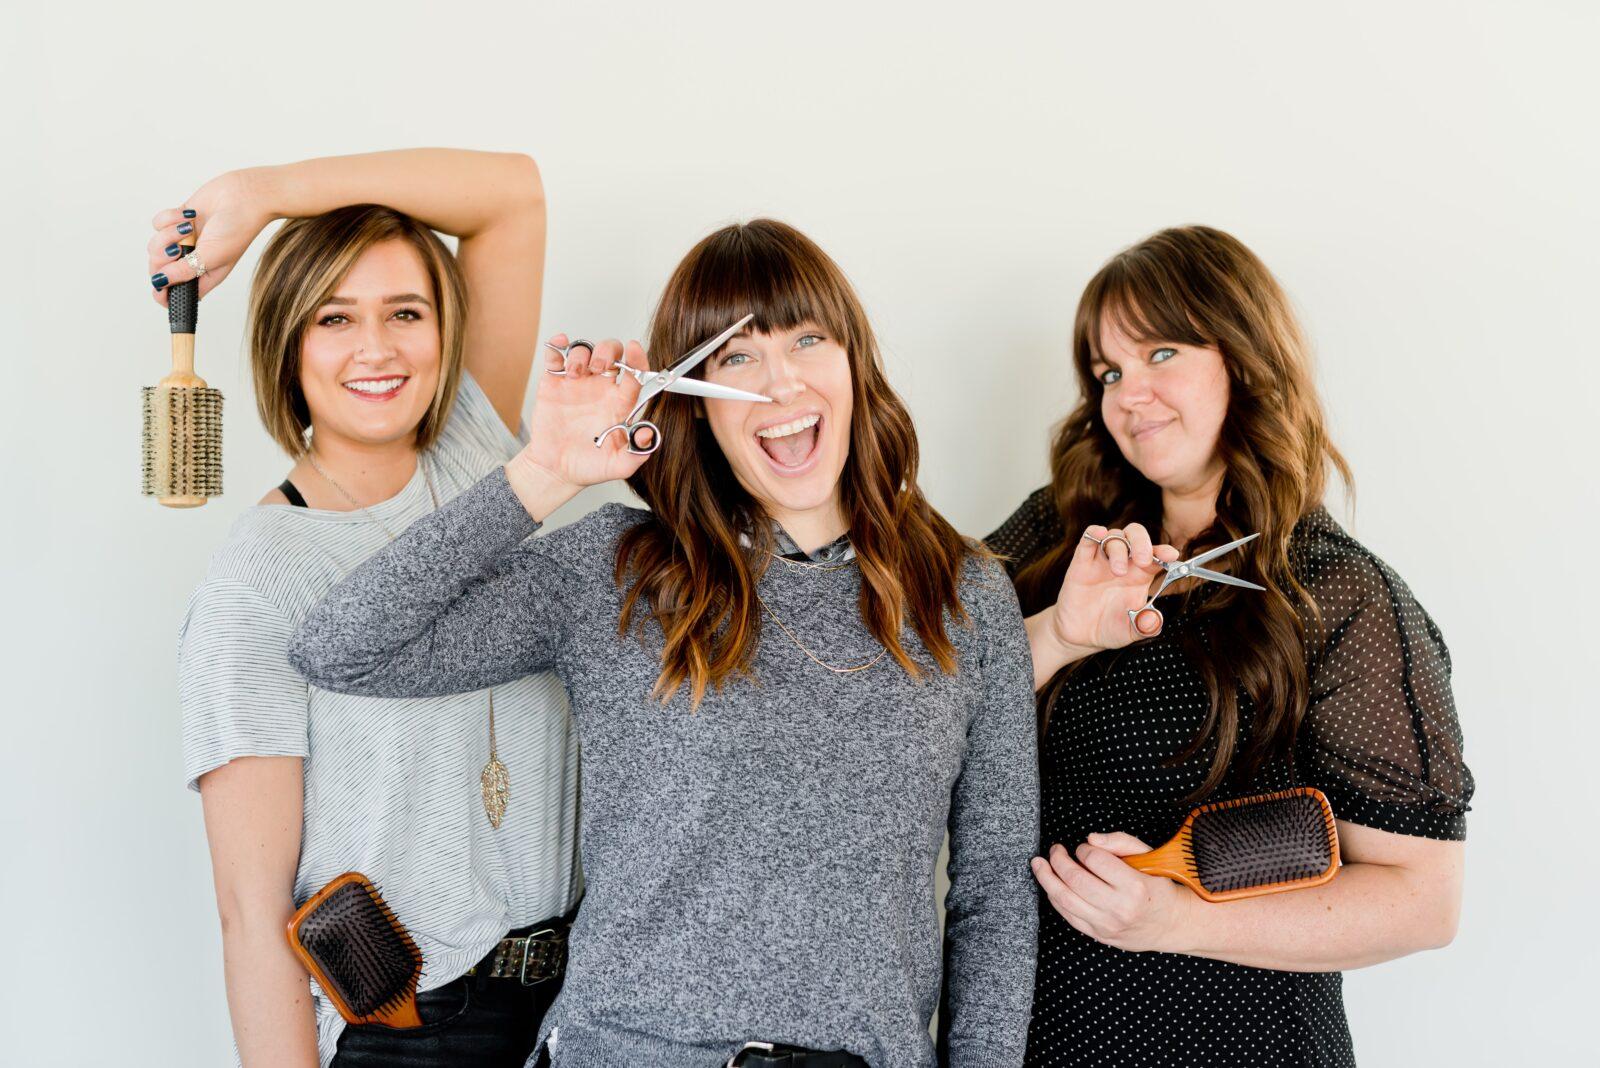 layered-haircut-women-beauty-tips-online-unsplash